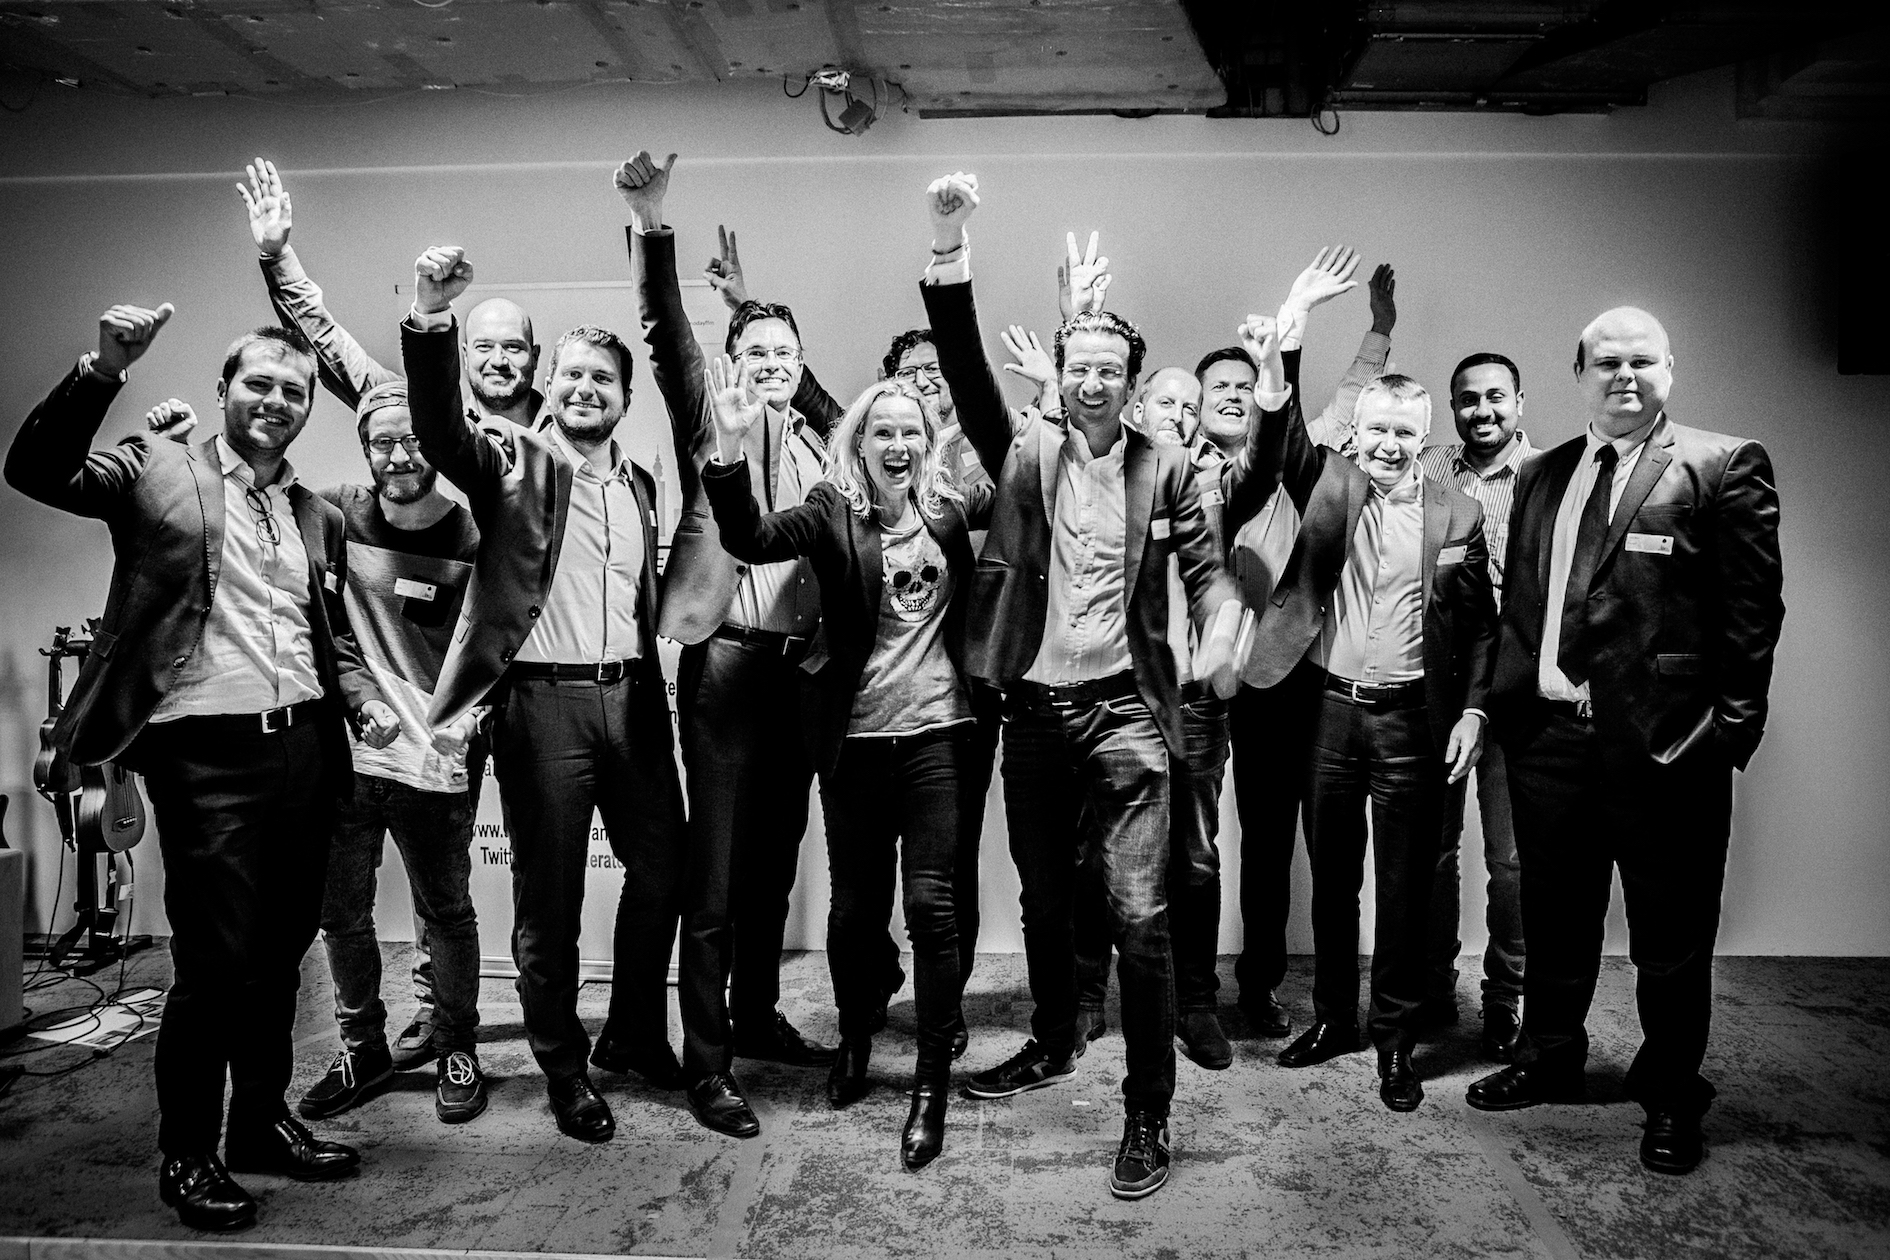 http://www.acceleratorfrankfurt.com/wp-content/uploads/2018/01/acc_1801_group_startups_3-2.jpg